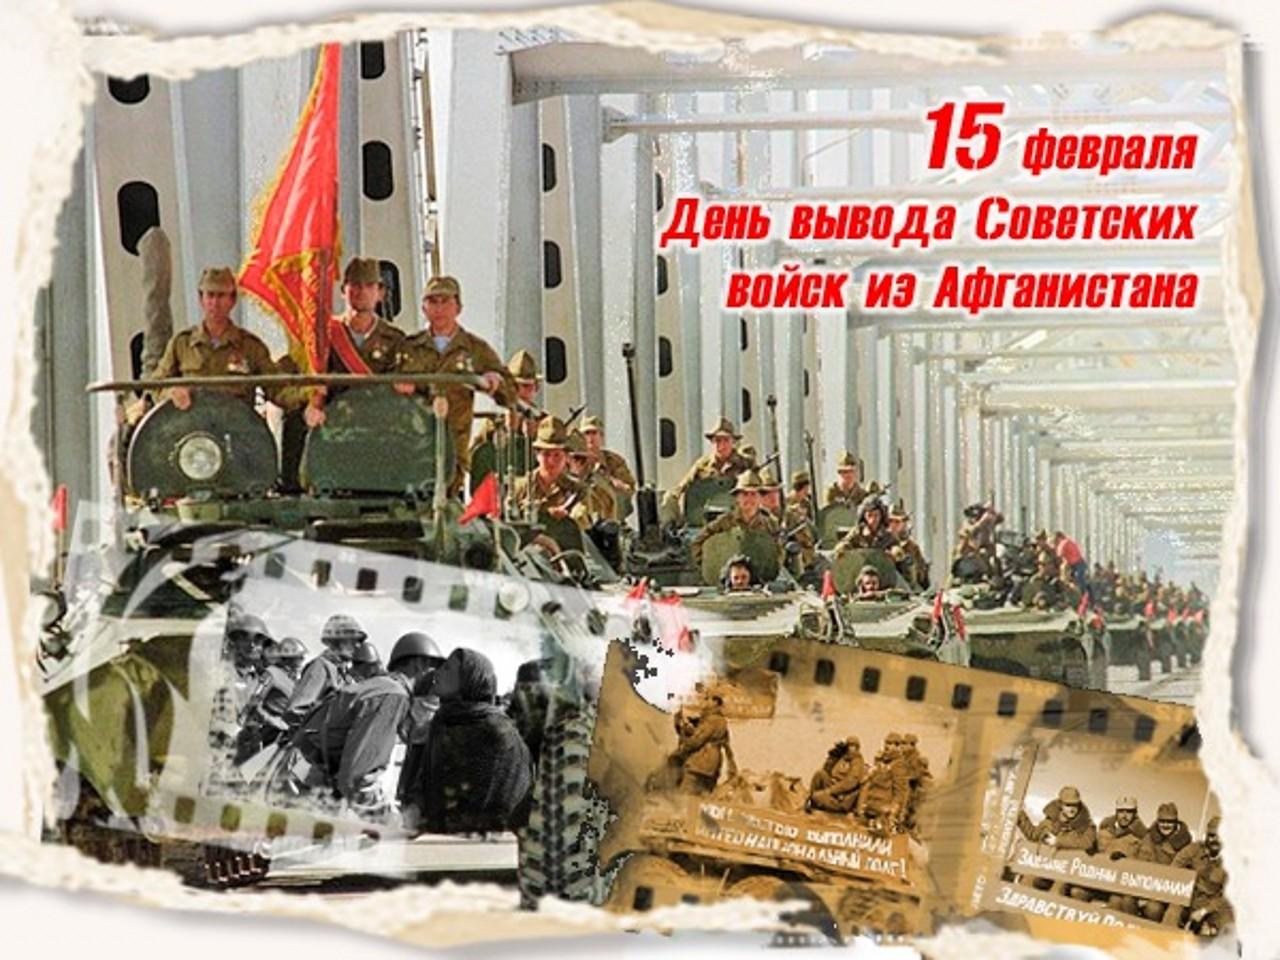 http://cbskuibishev.ru/images/FOTO_MATERIALOV/2015/15FEVRALY/ris2.jpg